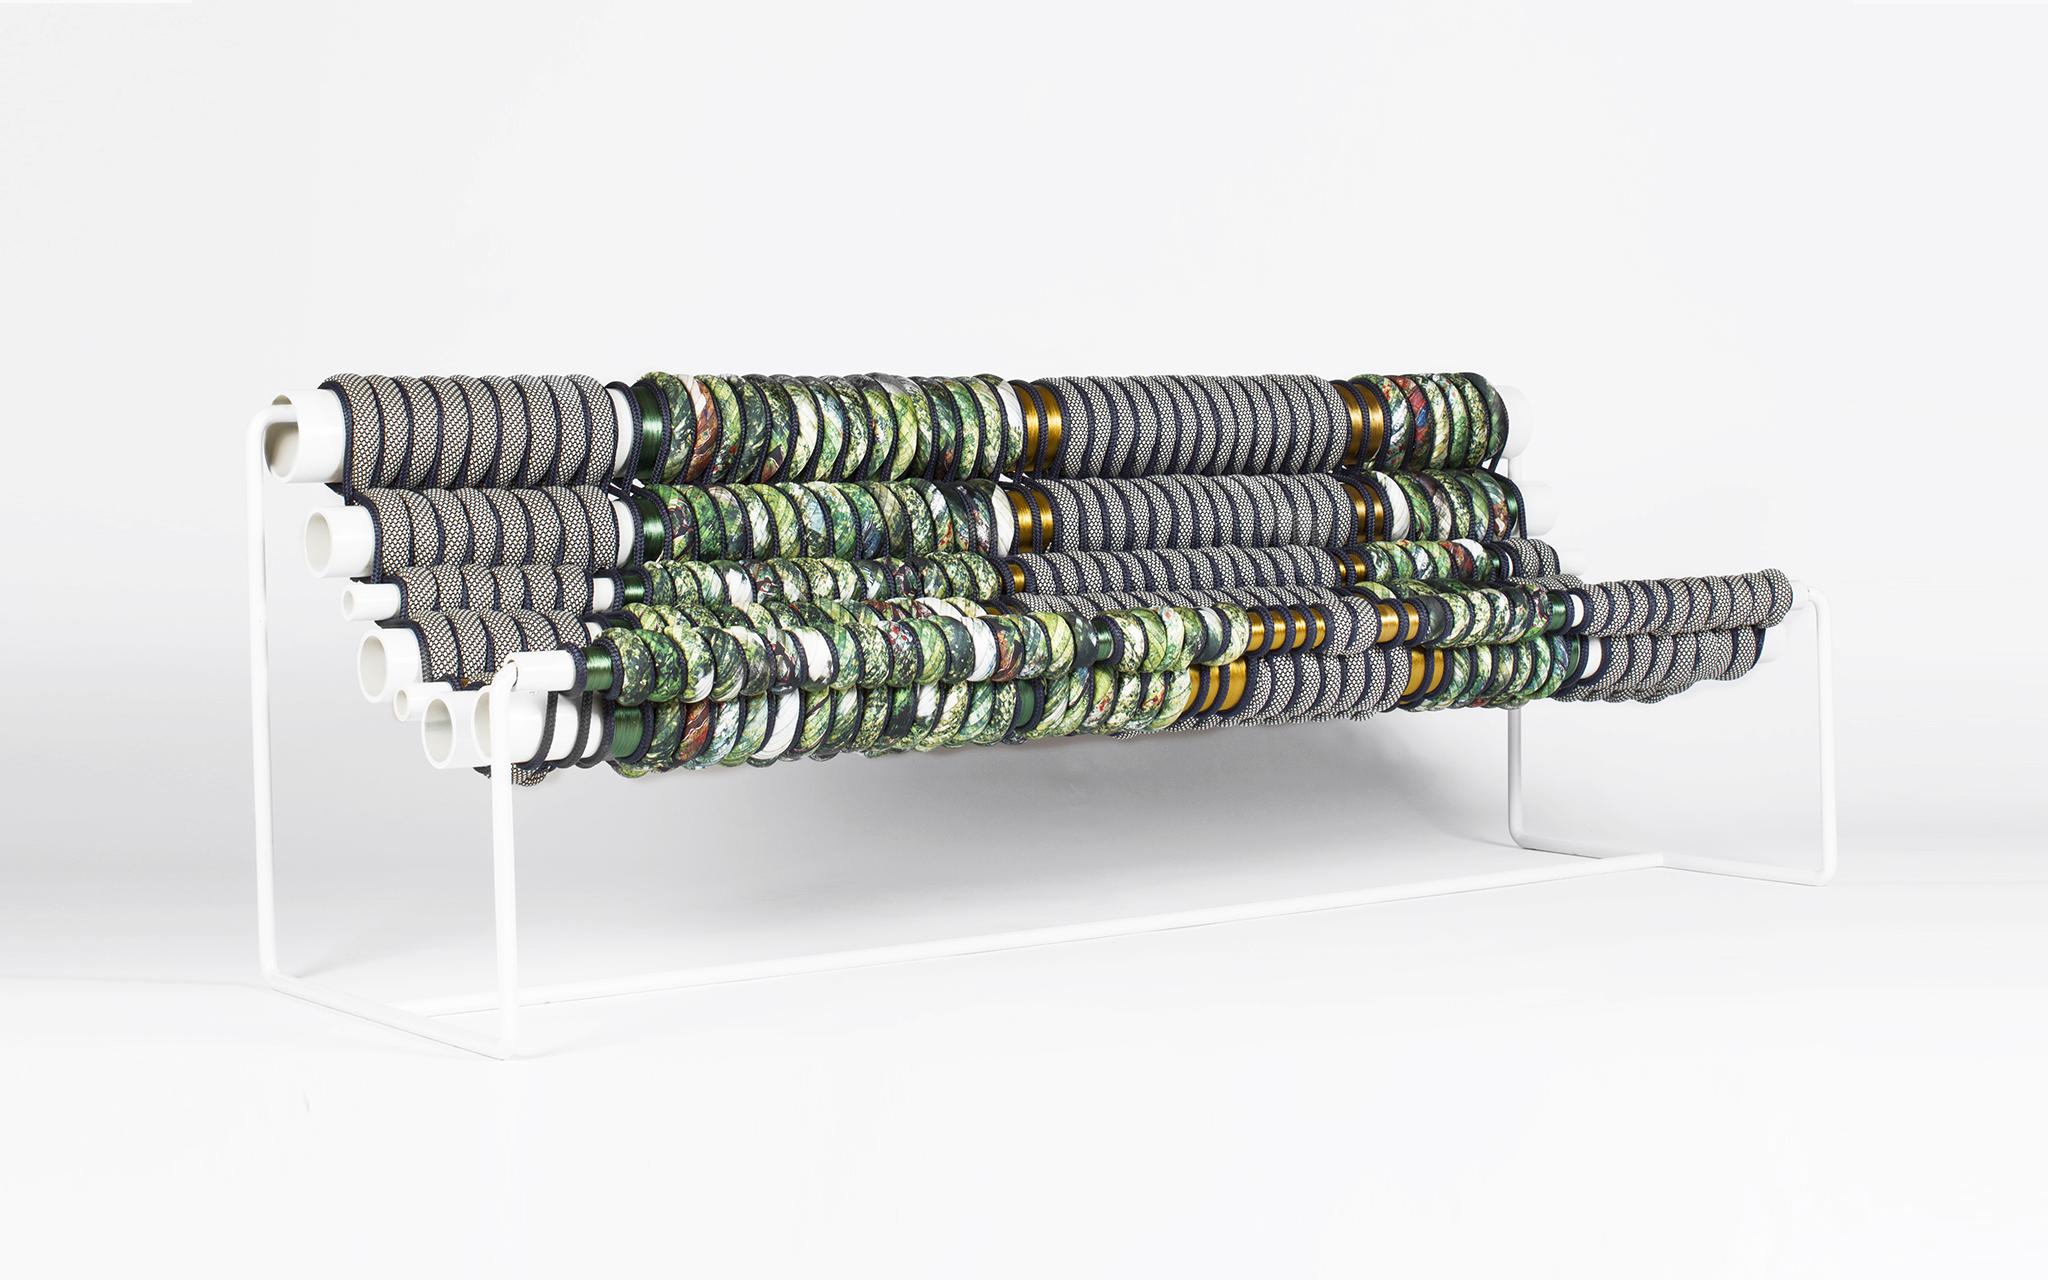 cristina-grajales-miami-design-basel-2018-02